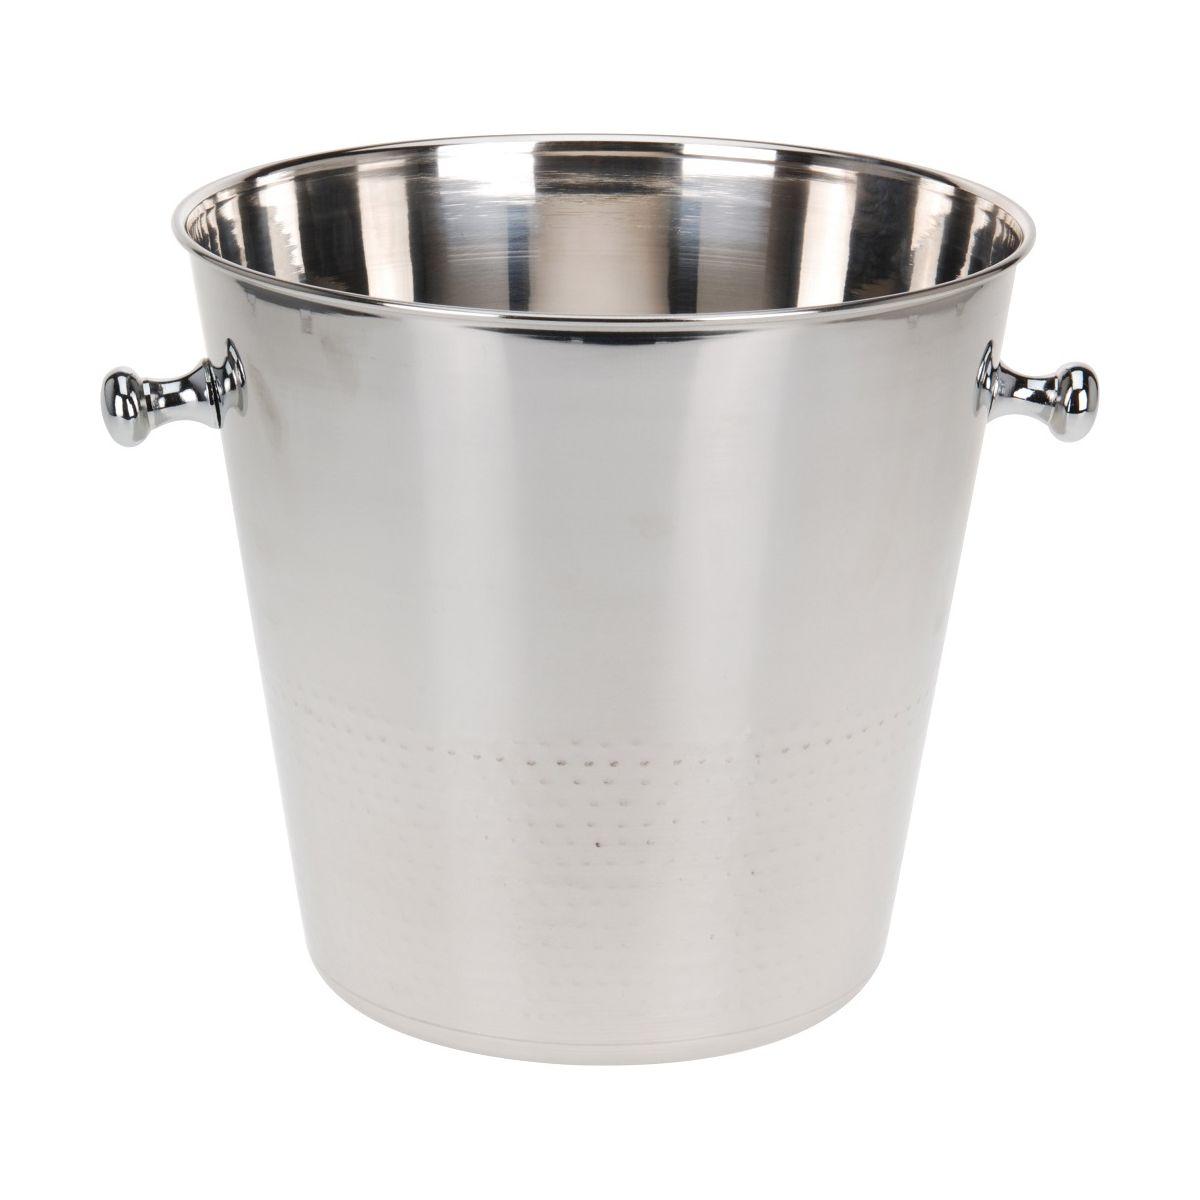 Ведро д/шампанского 15лведро для охлаждения шампанского, емк. 15л<br>